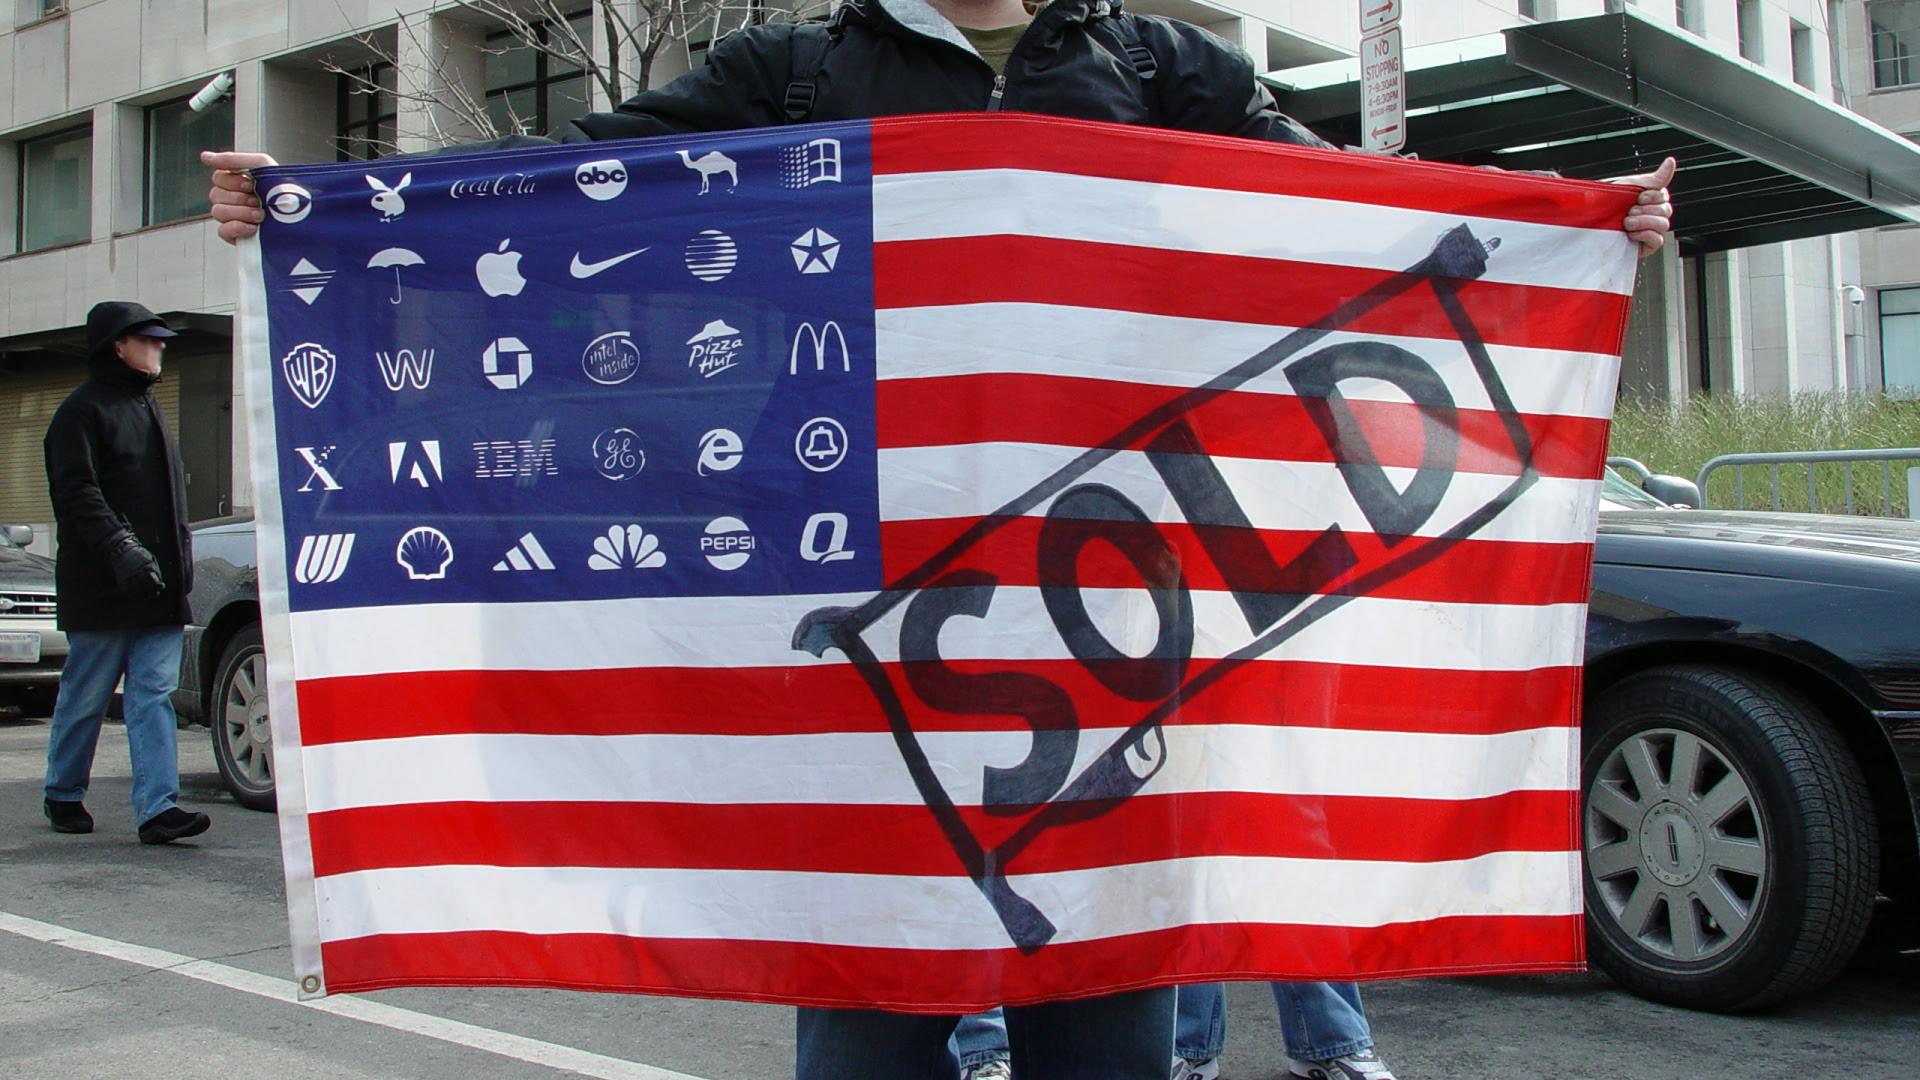 http://upload.wikimedia.org/wikipedia/commons/2/22/American_corporate_flag.jpg